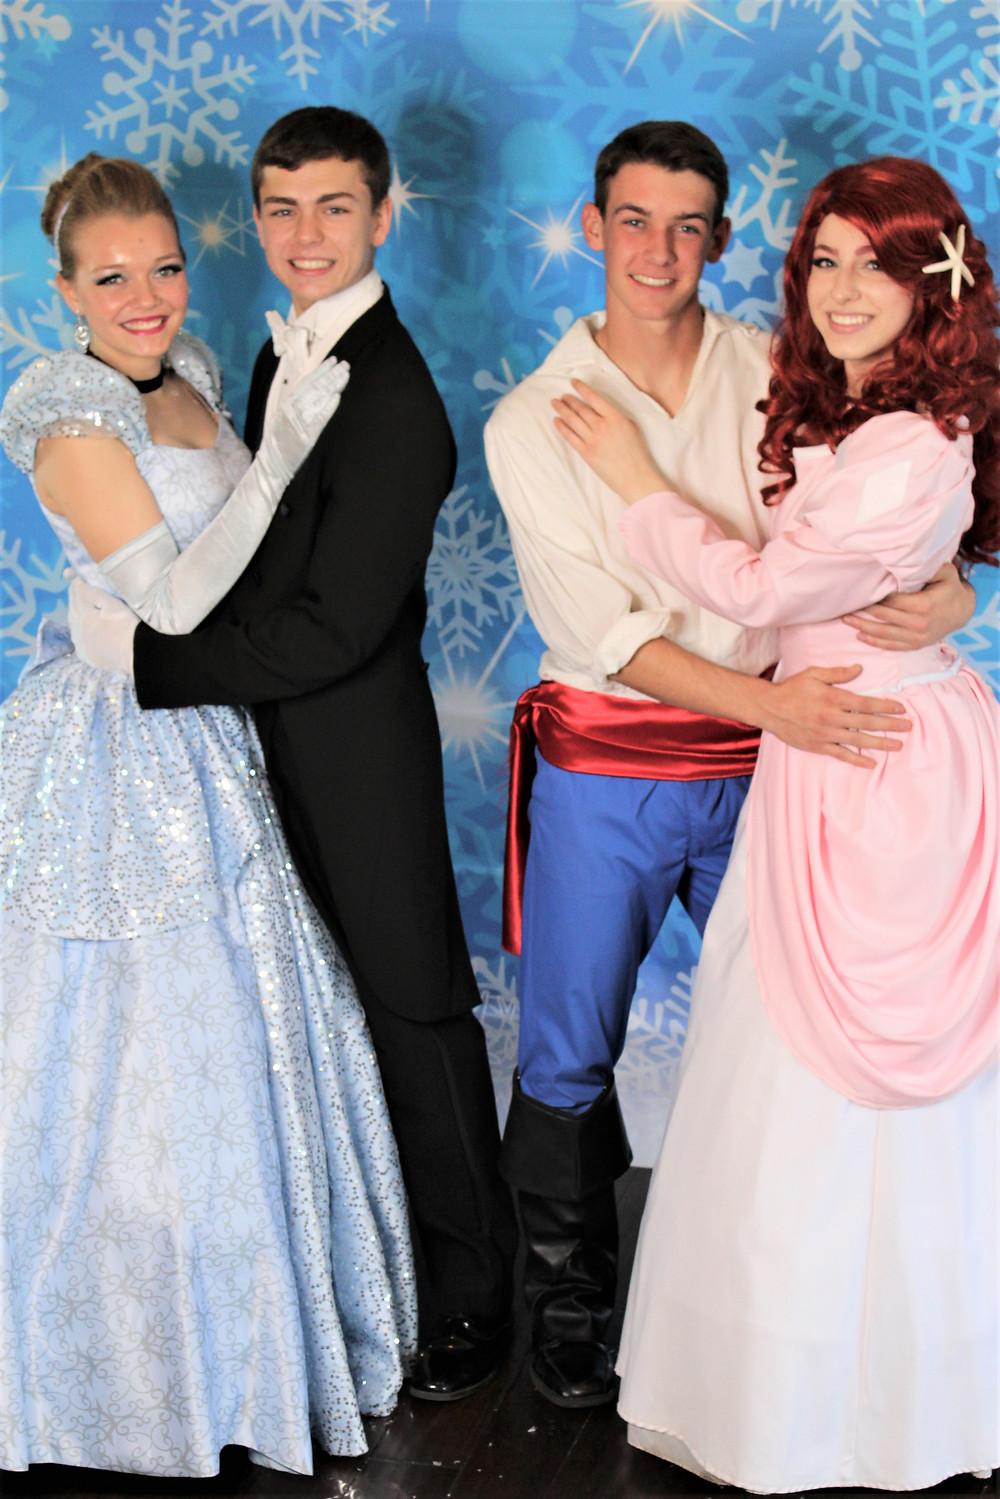 Cinderella, Prince Charming, Prince Eric, Ariel, Mermaid Princes